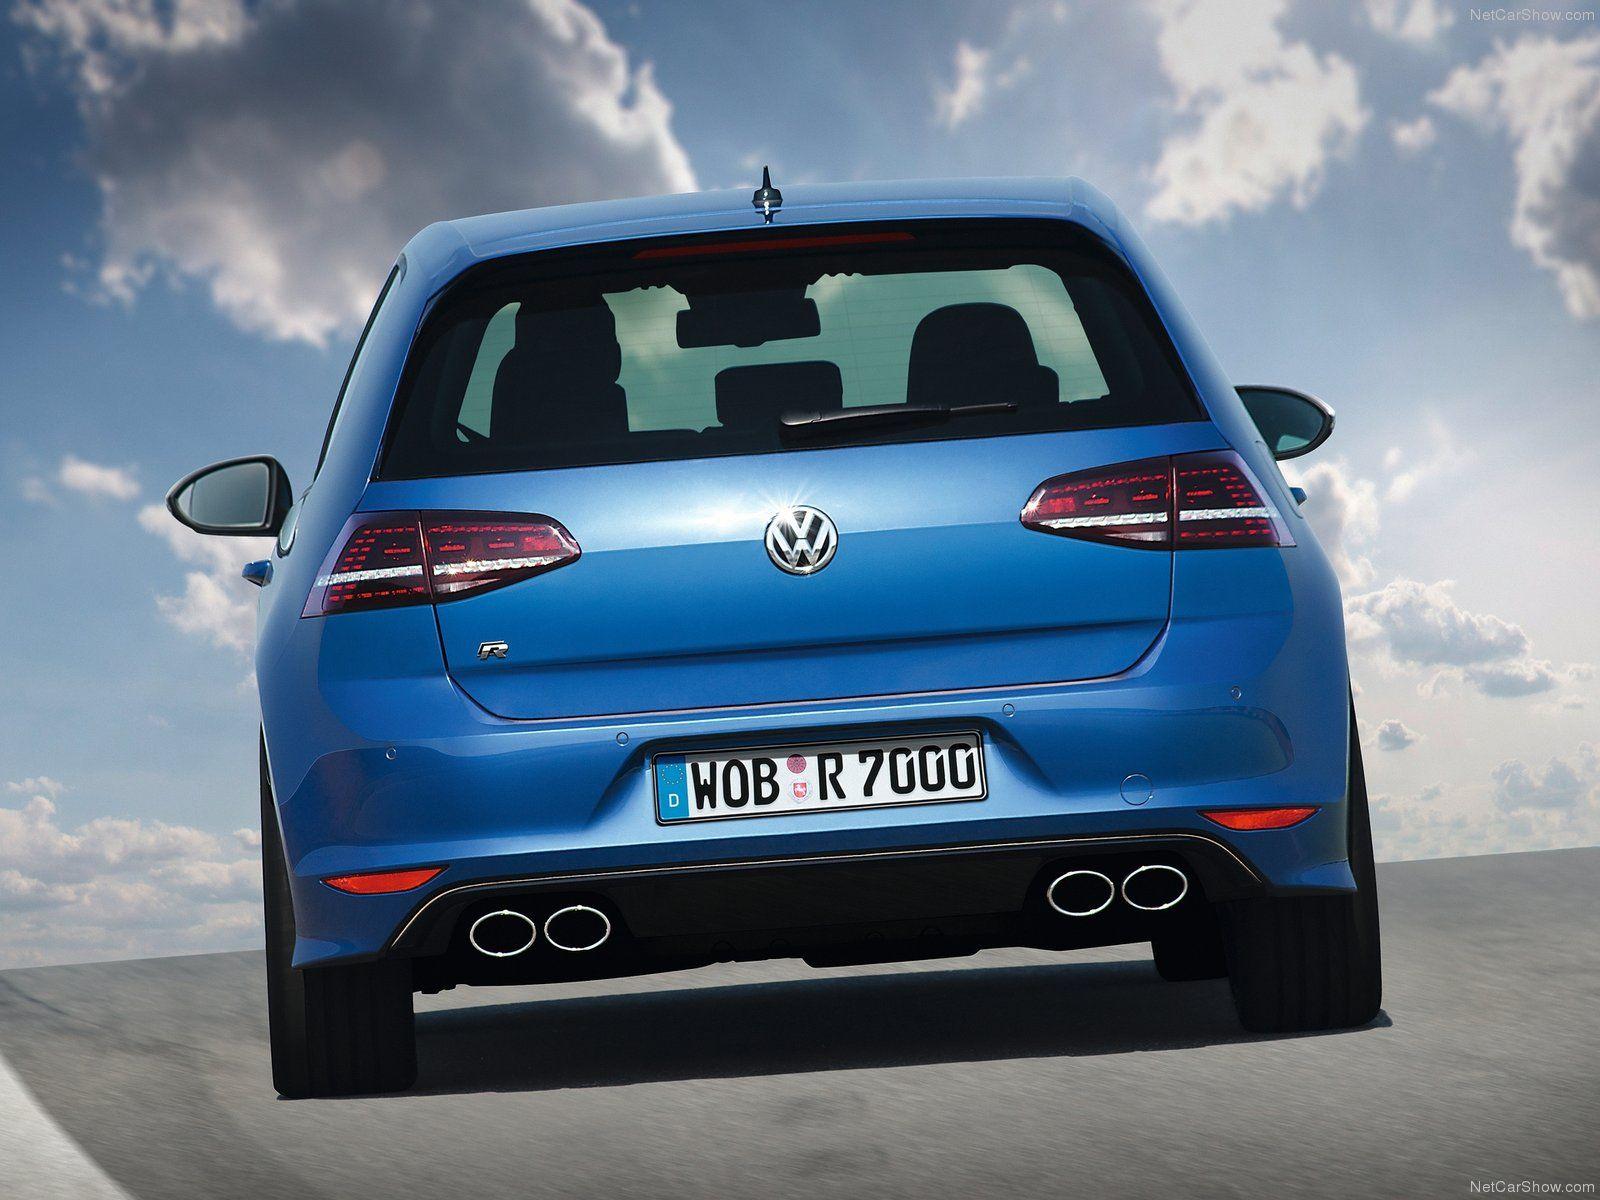 Volkswagen Golf R 2014 Volkswagen Volkswagen Golf Volkswagen